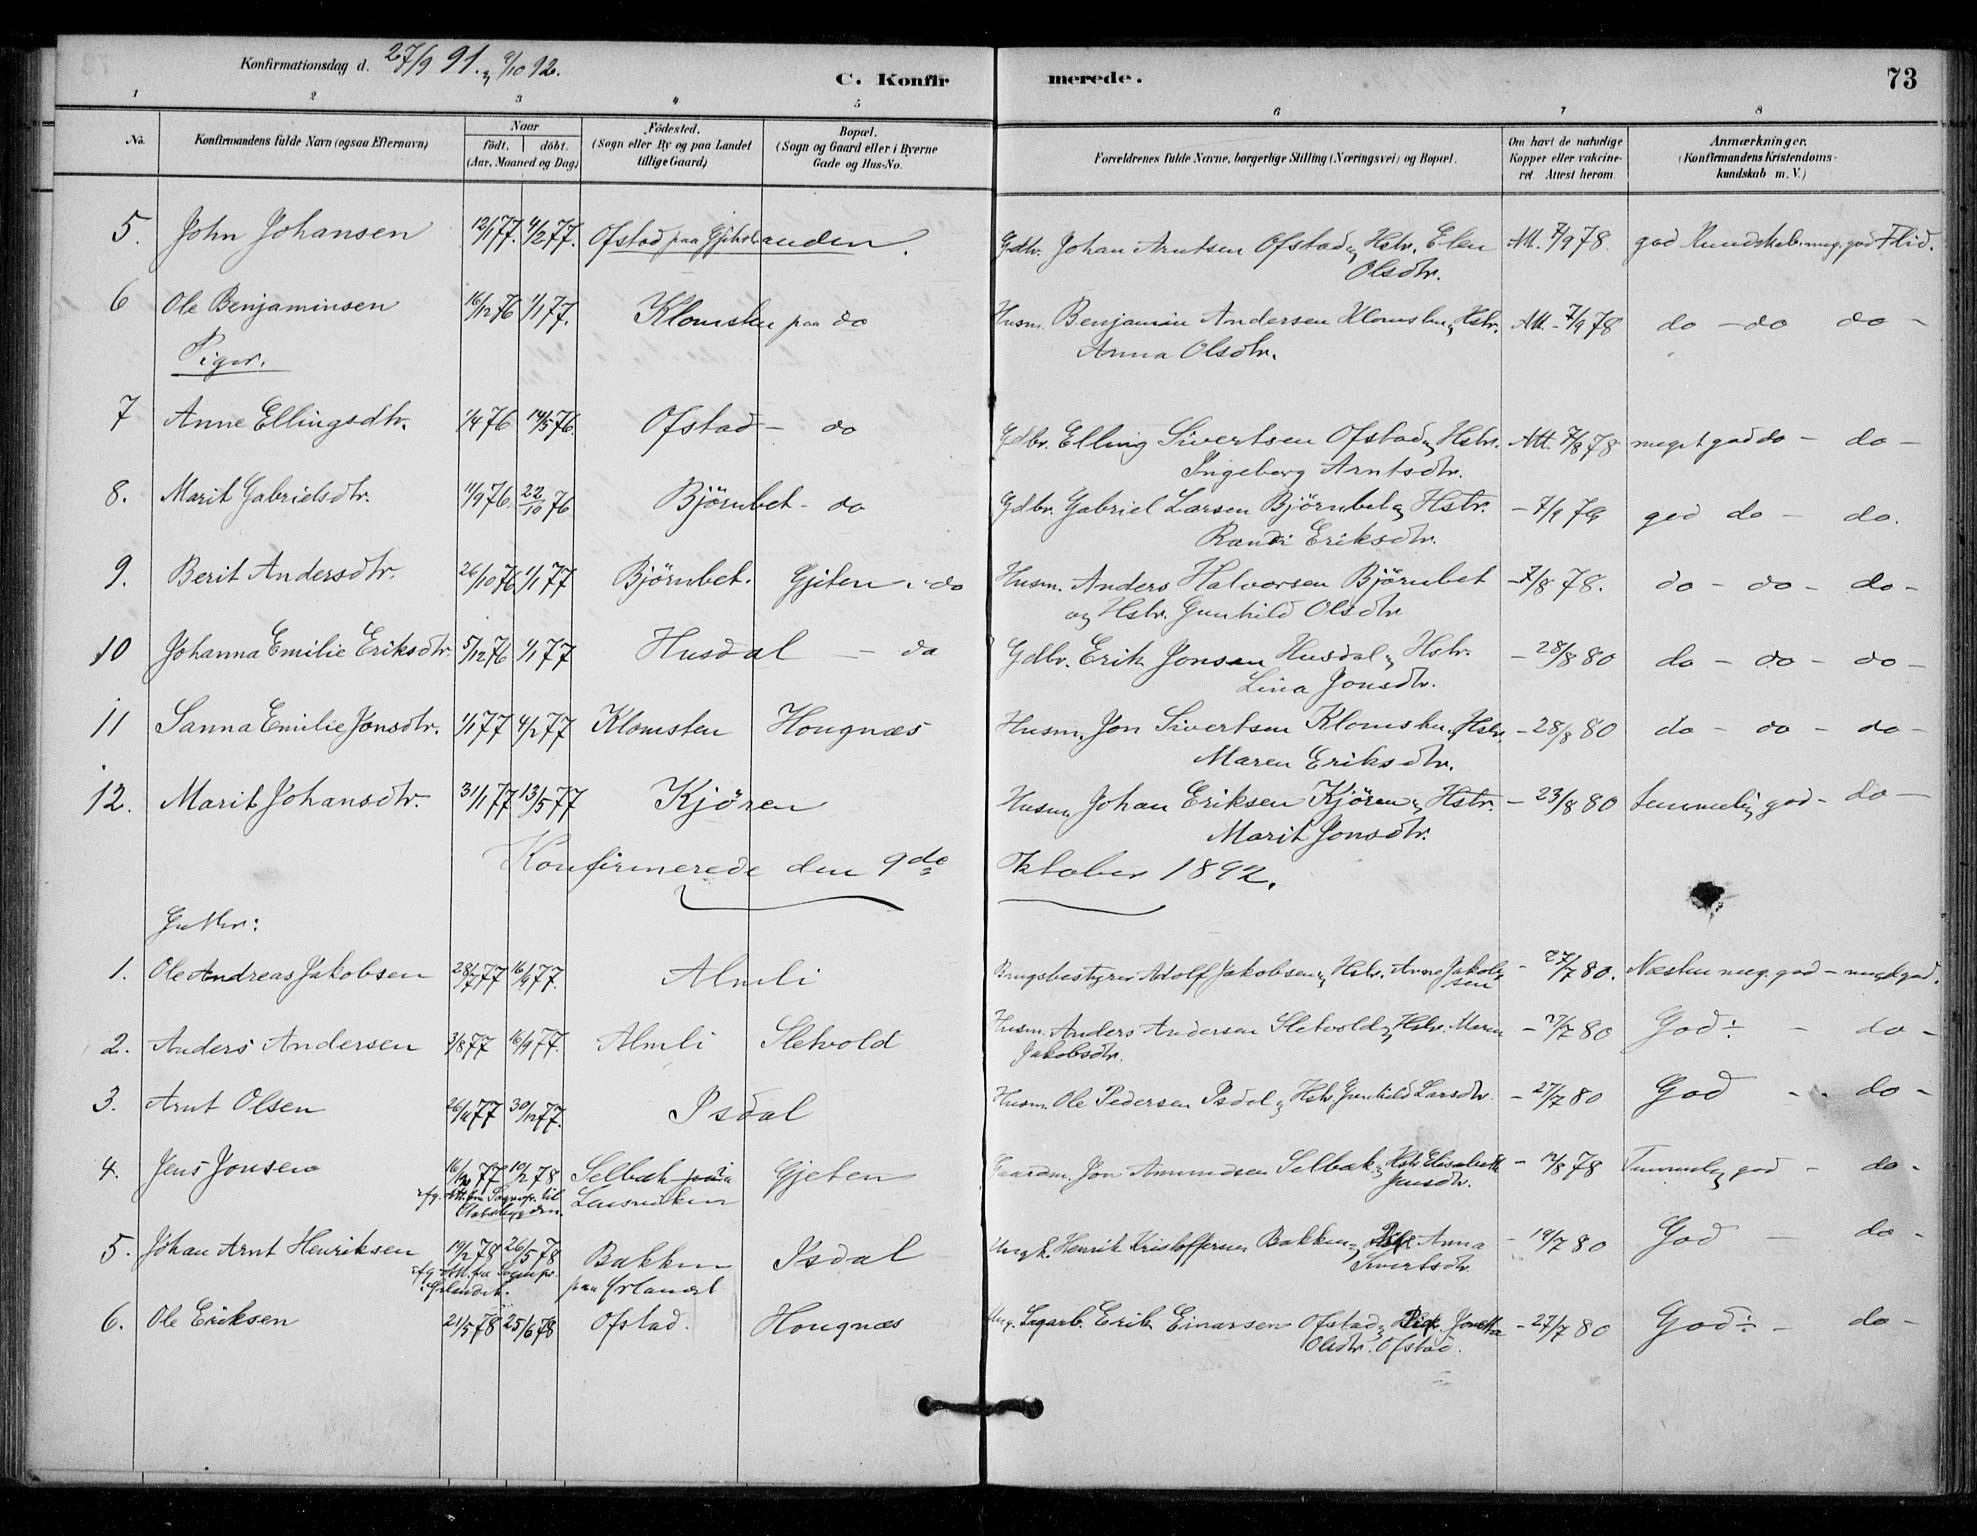 SAT, Ministerialprotokoller, klokkerbøker og fødselsregistre - Sør-Trøndelag, 670/L0836: Parish register (official) no. 670A01, 1879-1904, p. 73